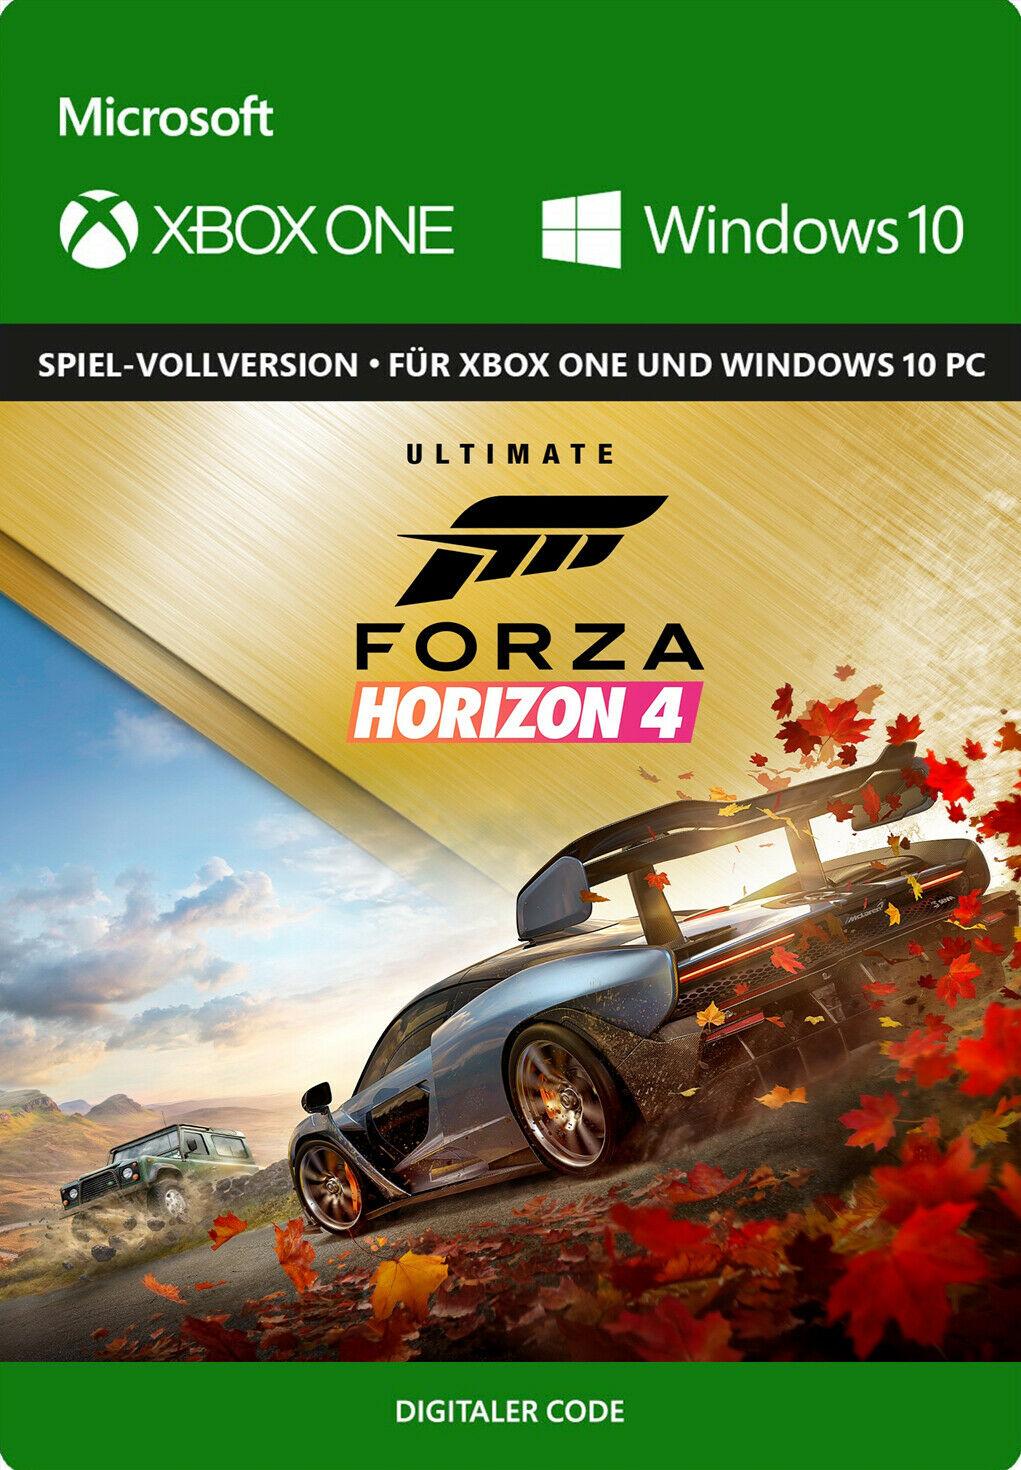 Forza Horizon 4 Ultimate Edition · Xbox One / Series X S & Windows 10 PC · Microsoft Store Island